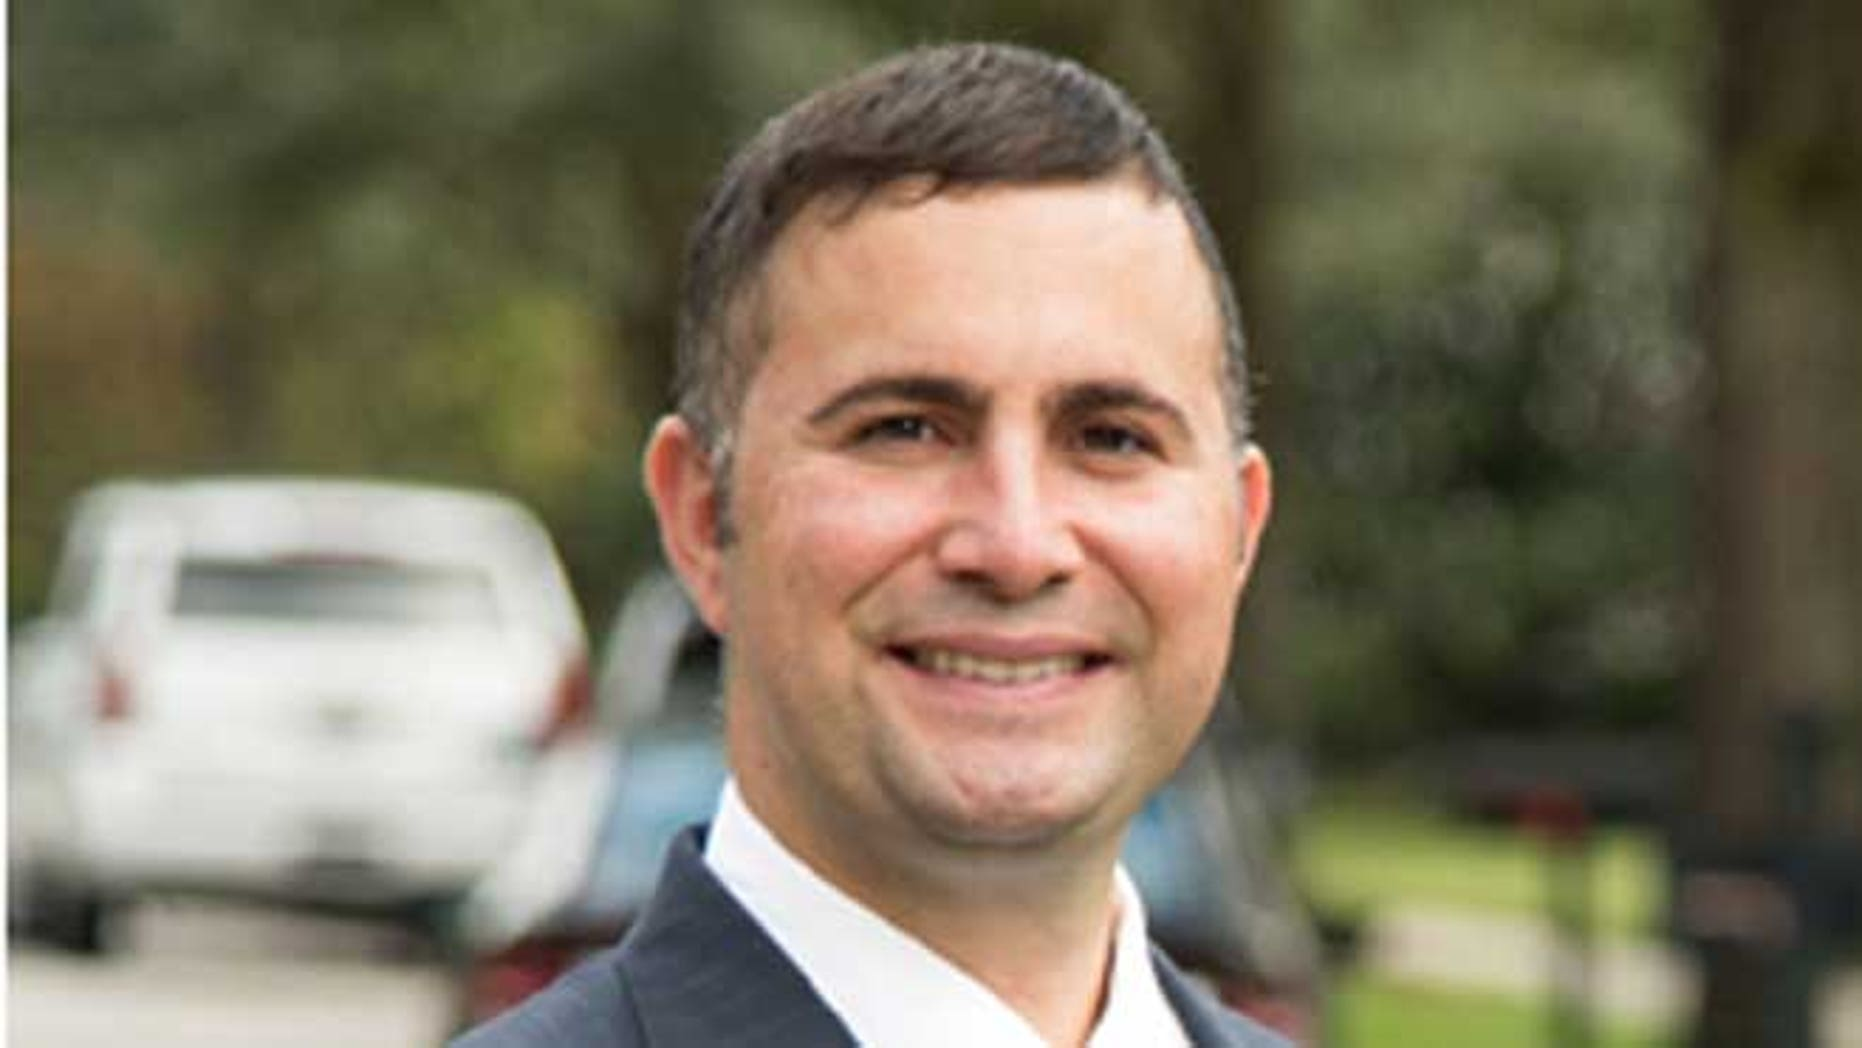 Congressional candidate Darren Soto, Florida Democrat